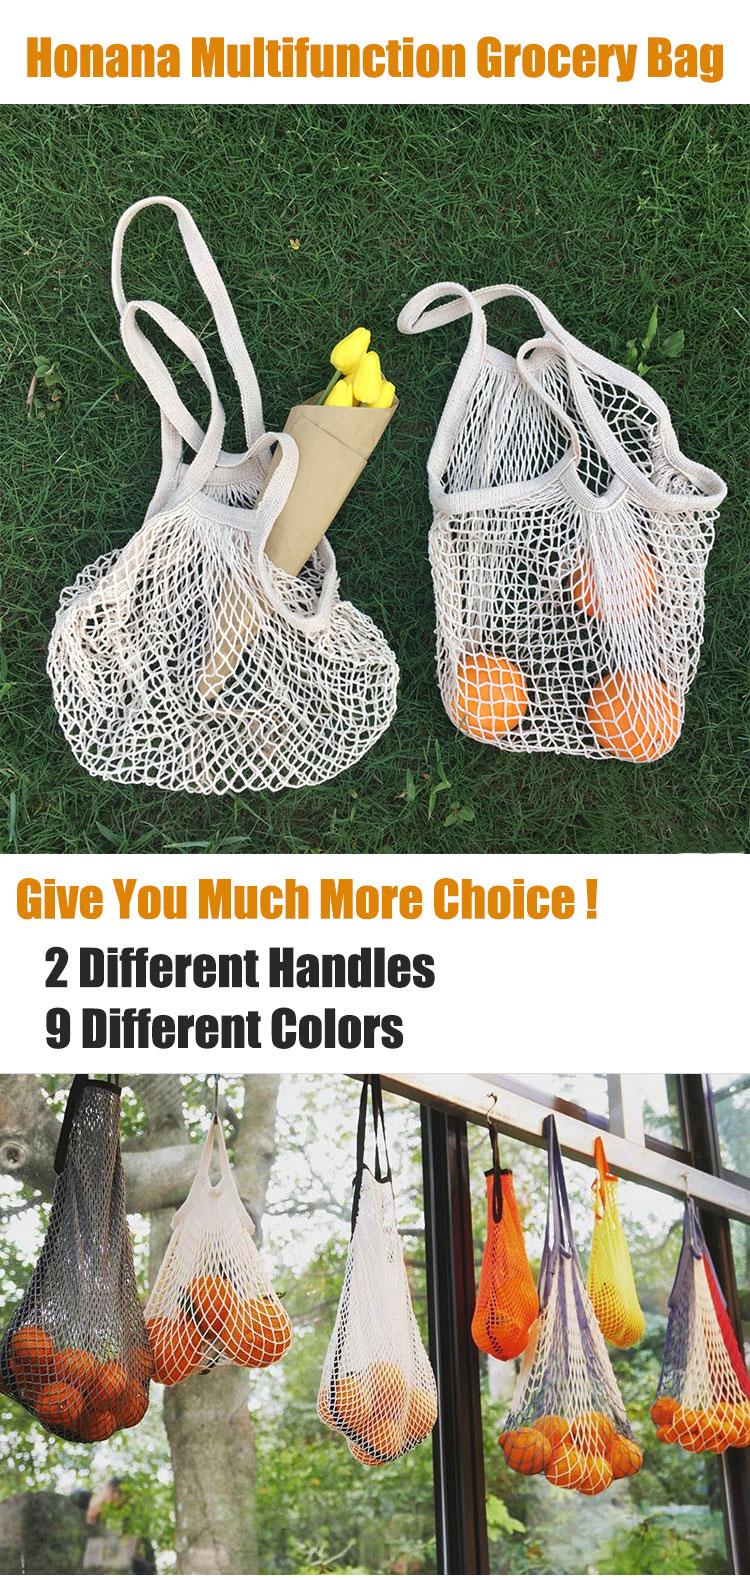 Honana HN-B27 Multifunctional Reusable Grocery Bags 9 Colors String Shopping Bag Mesh Storage Bag